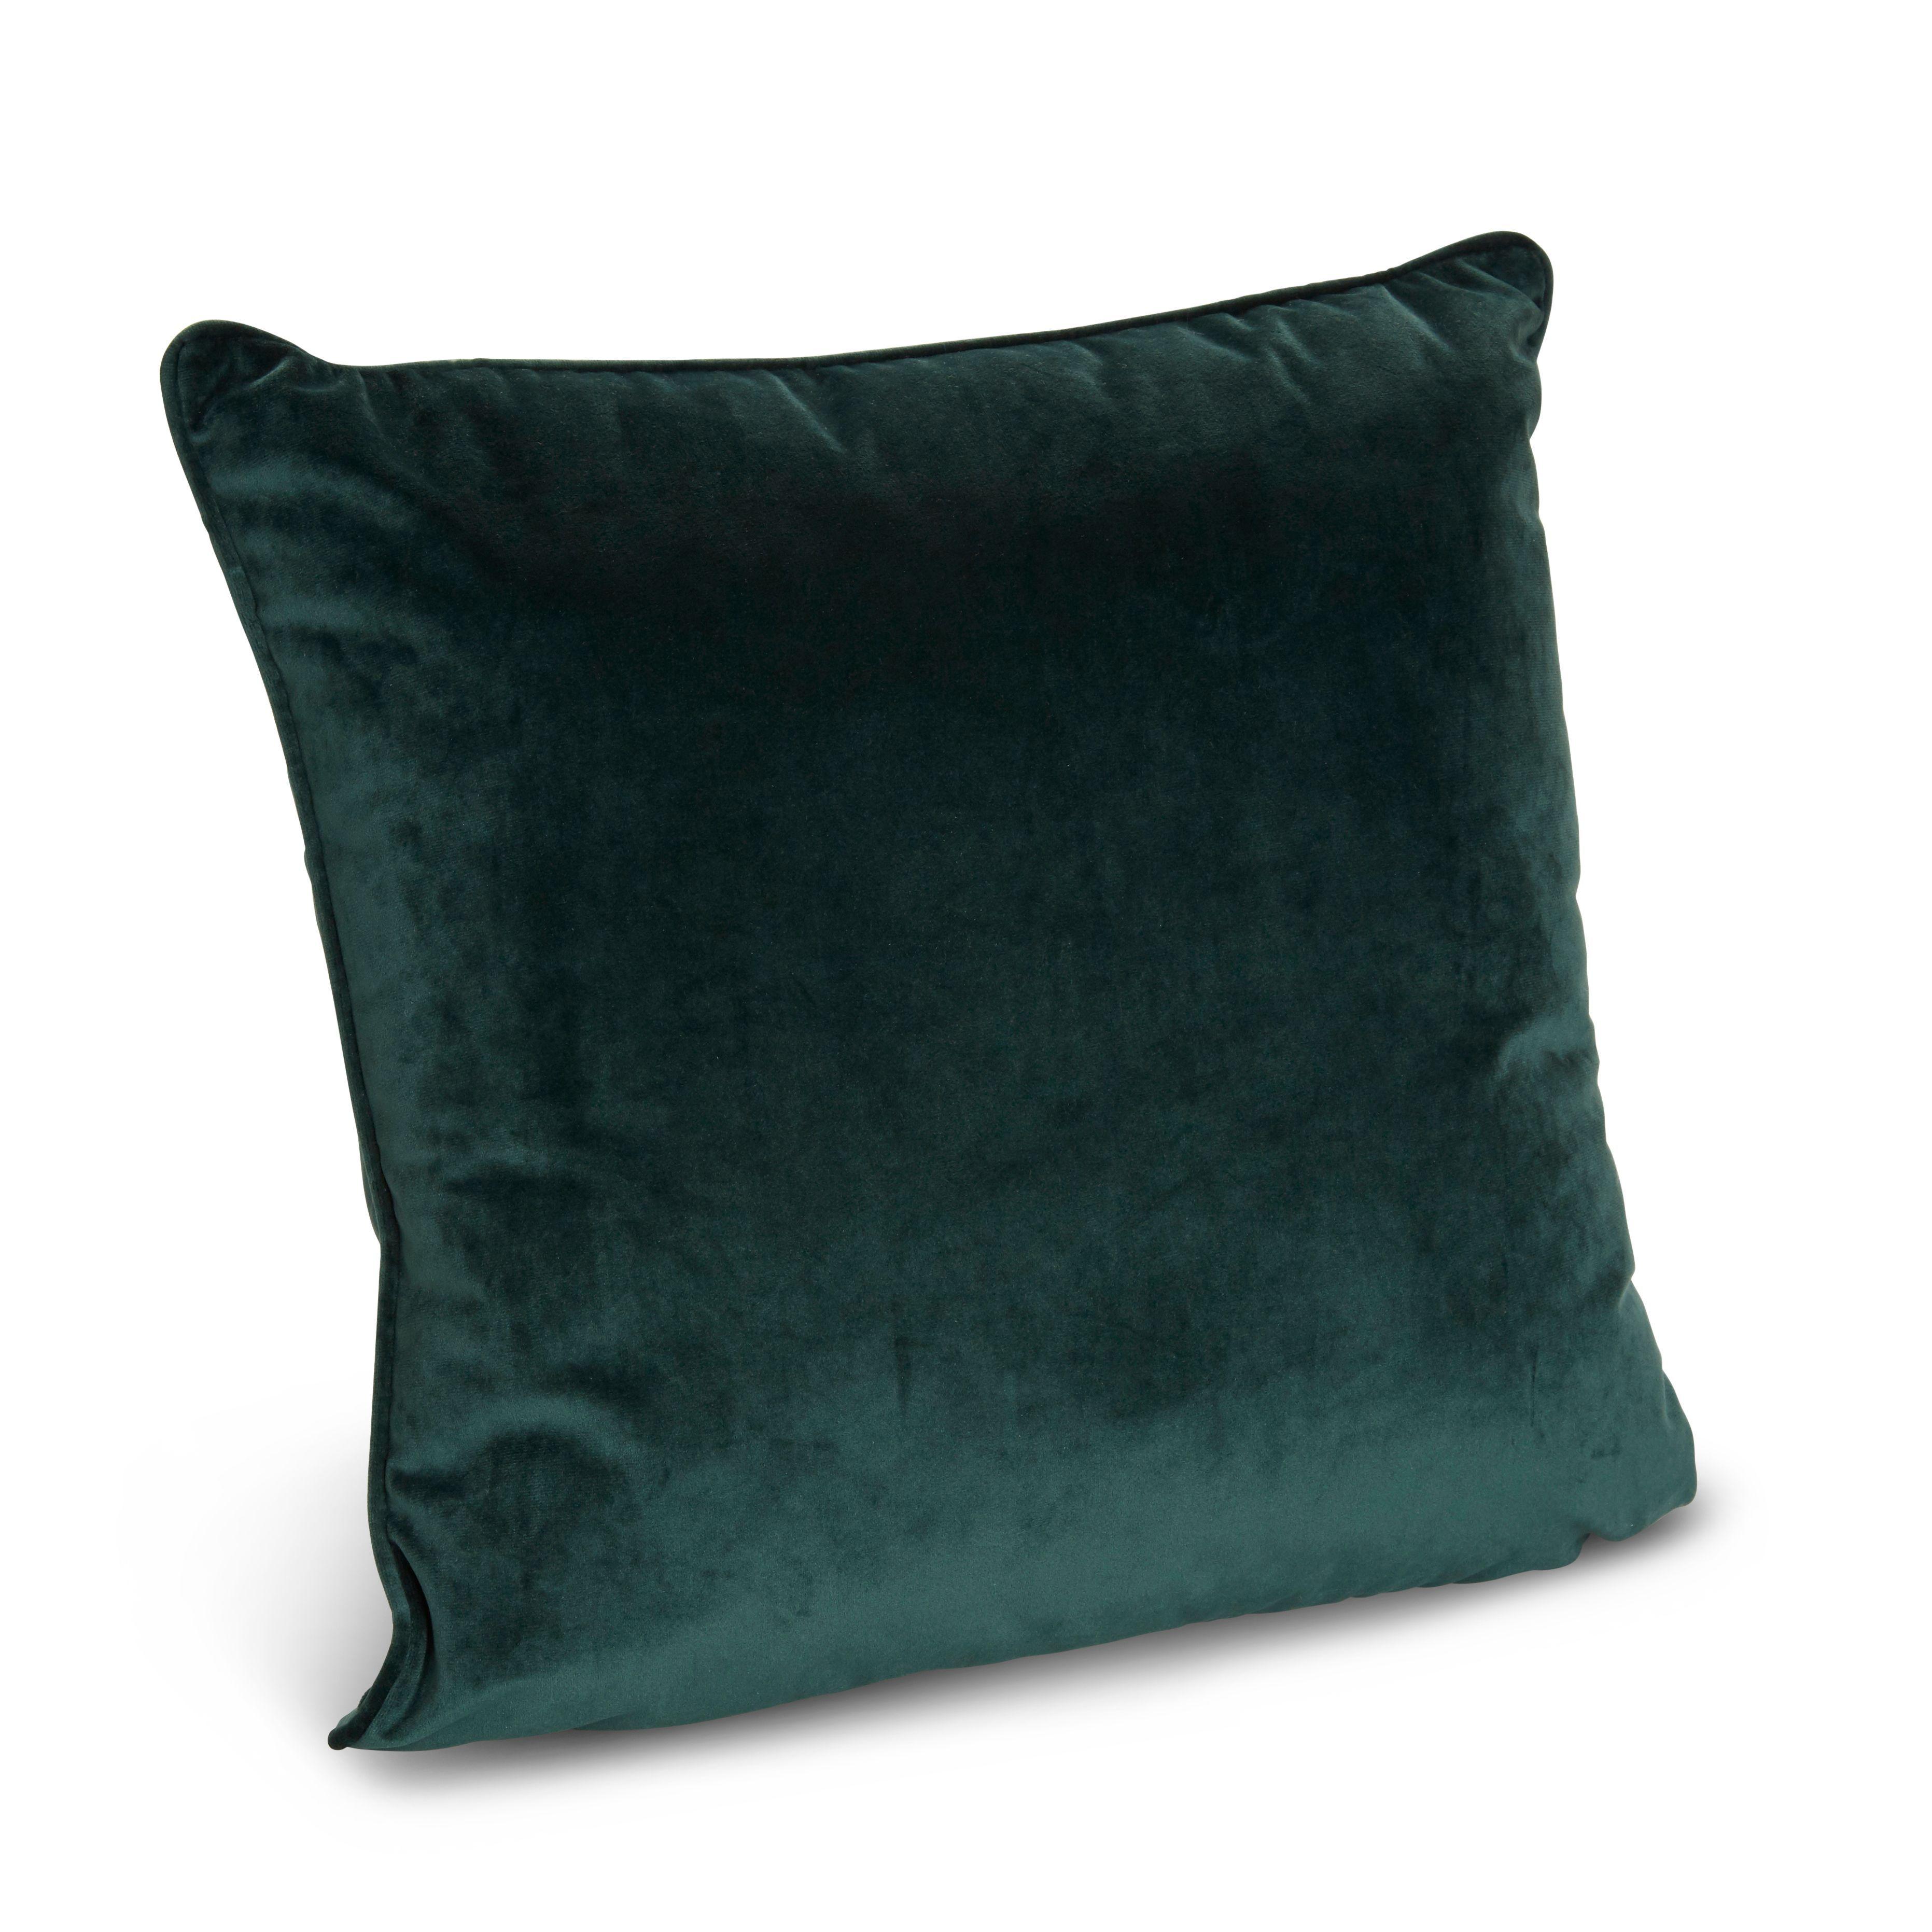 Teegan velvet green cushion departments diy at buq hunter